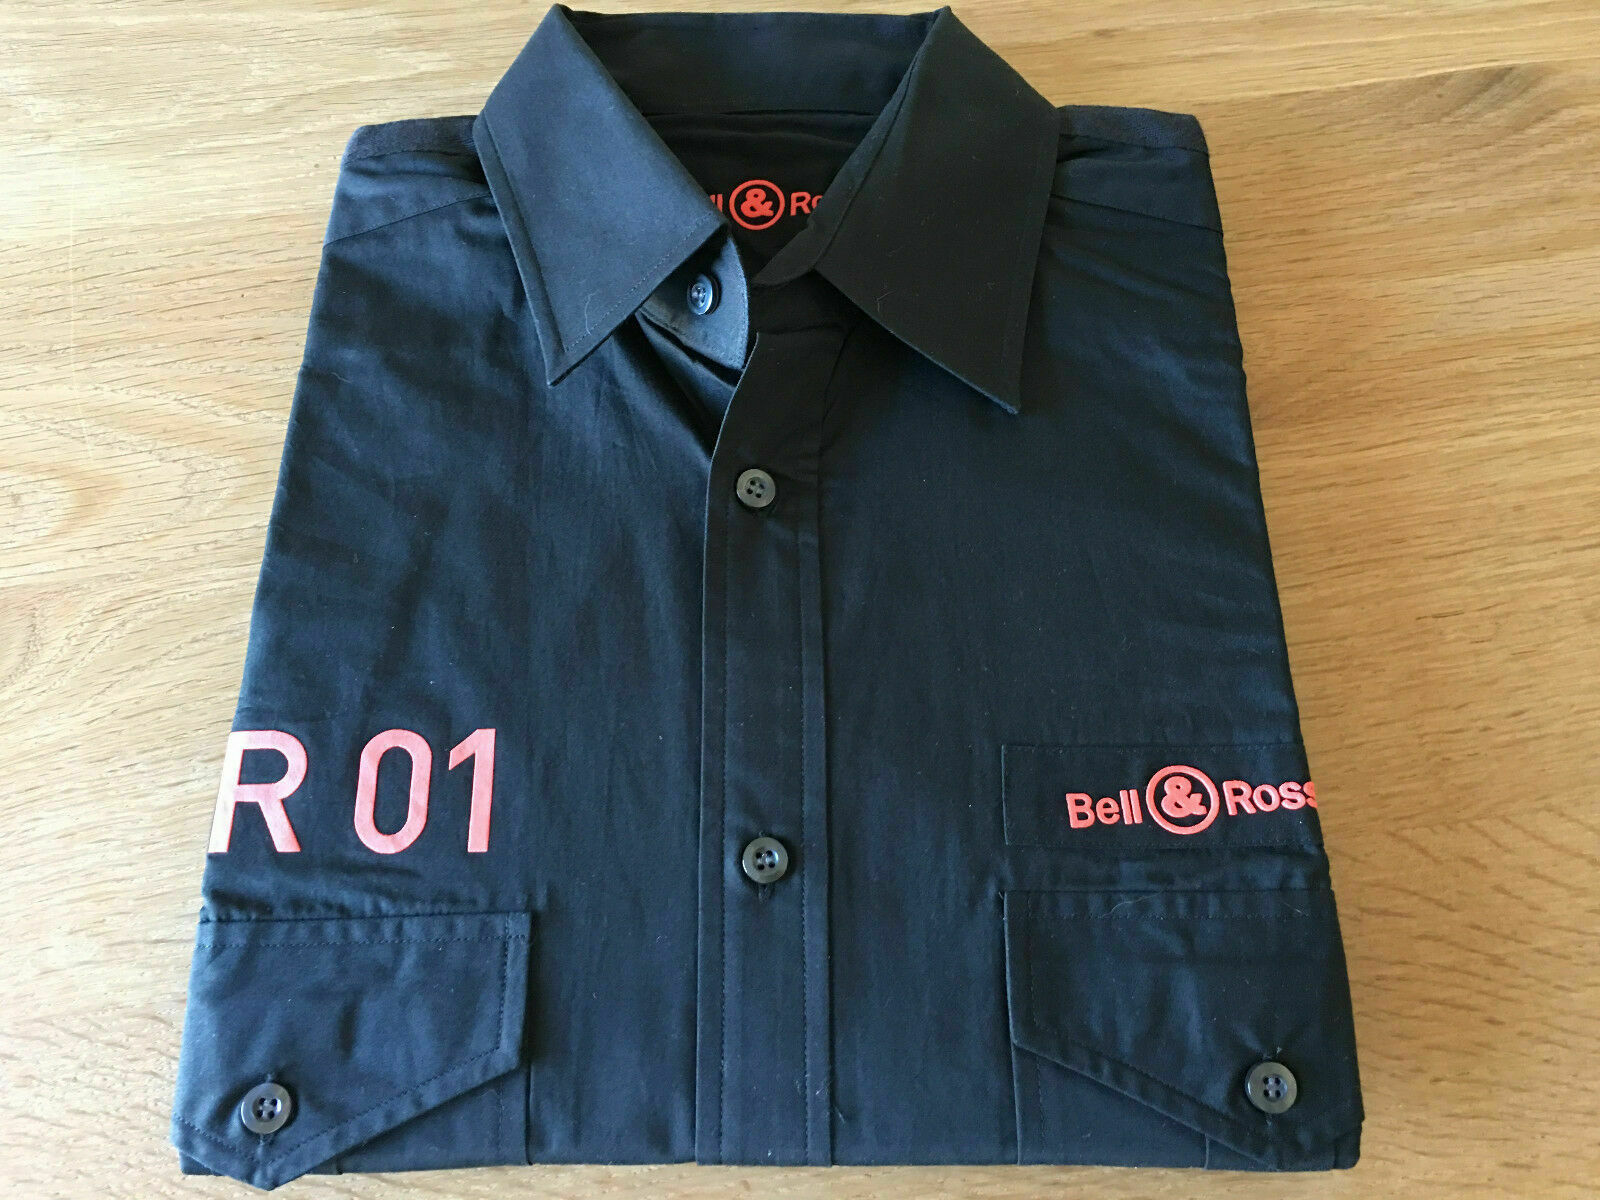 Nueva - BELL & ROSS BR 01 - Camisa Shirt - Size...